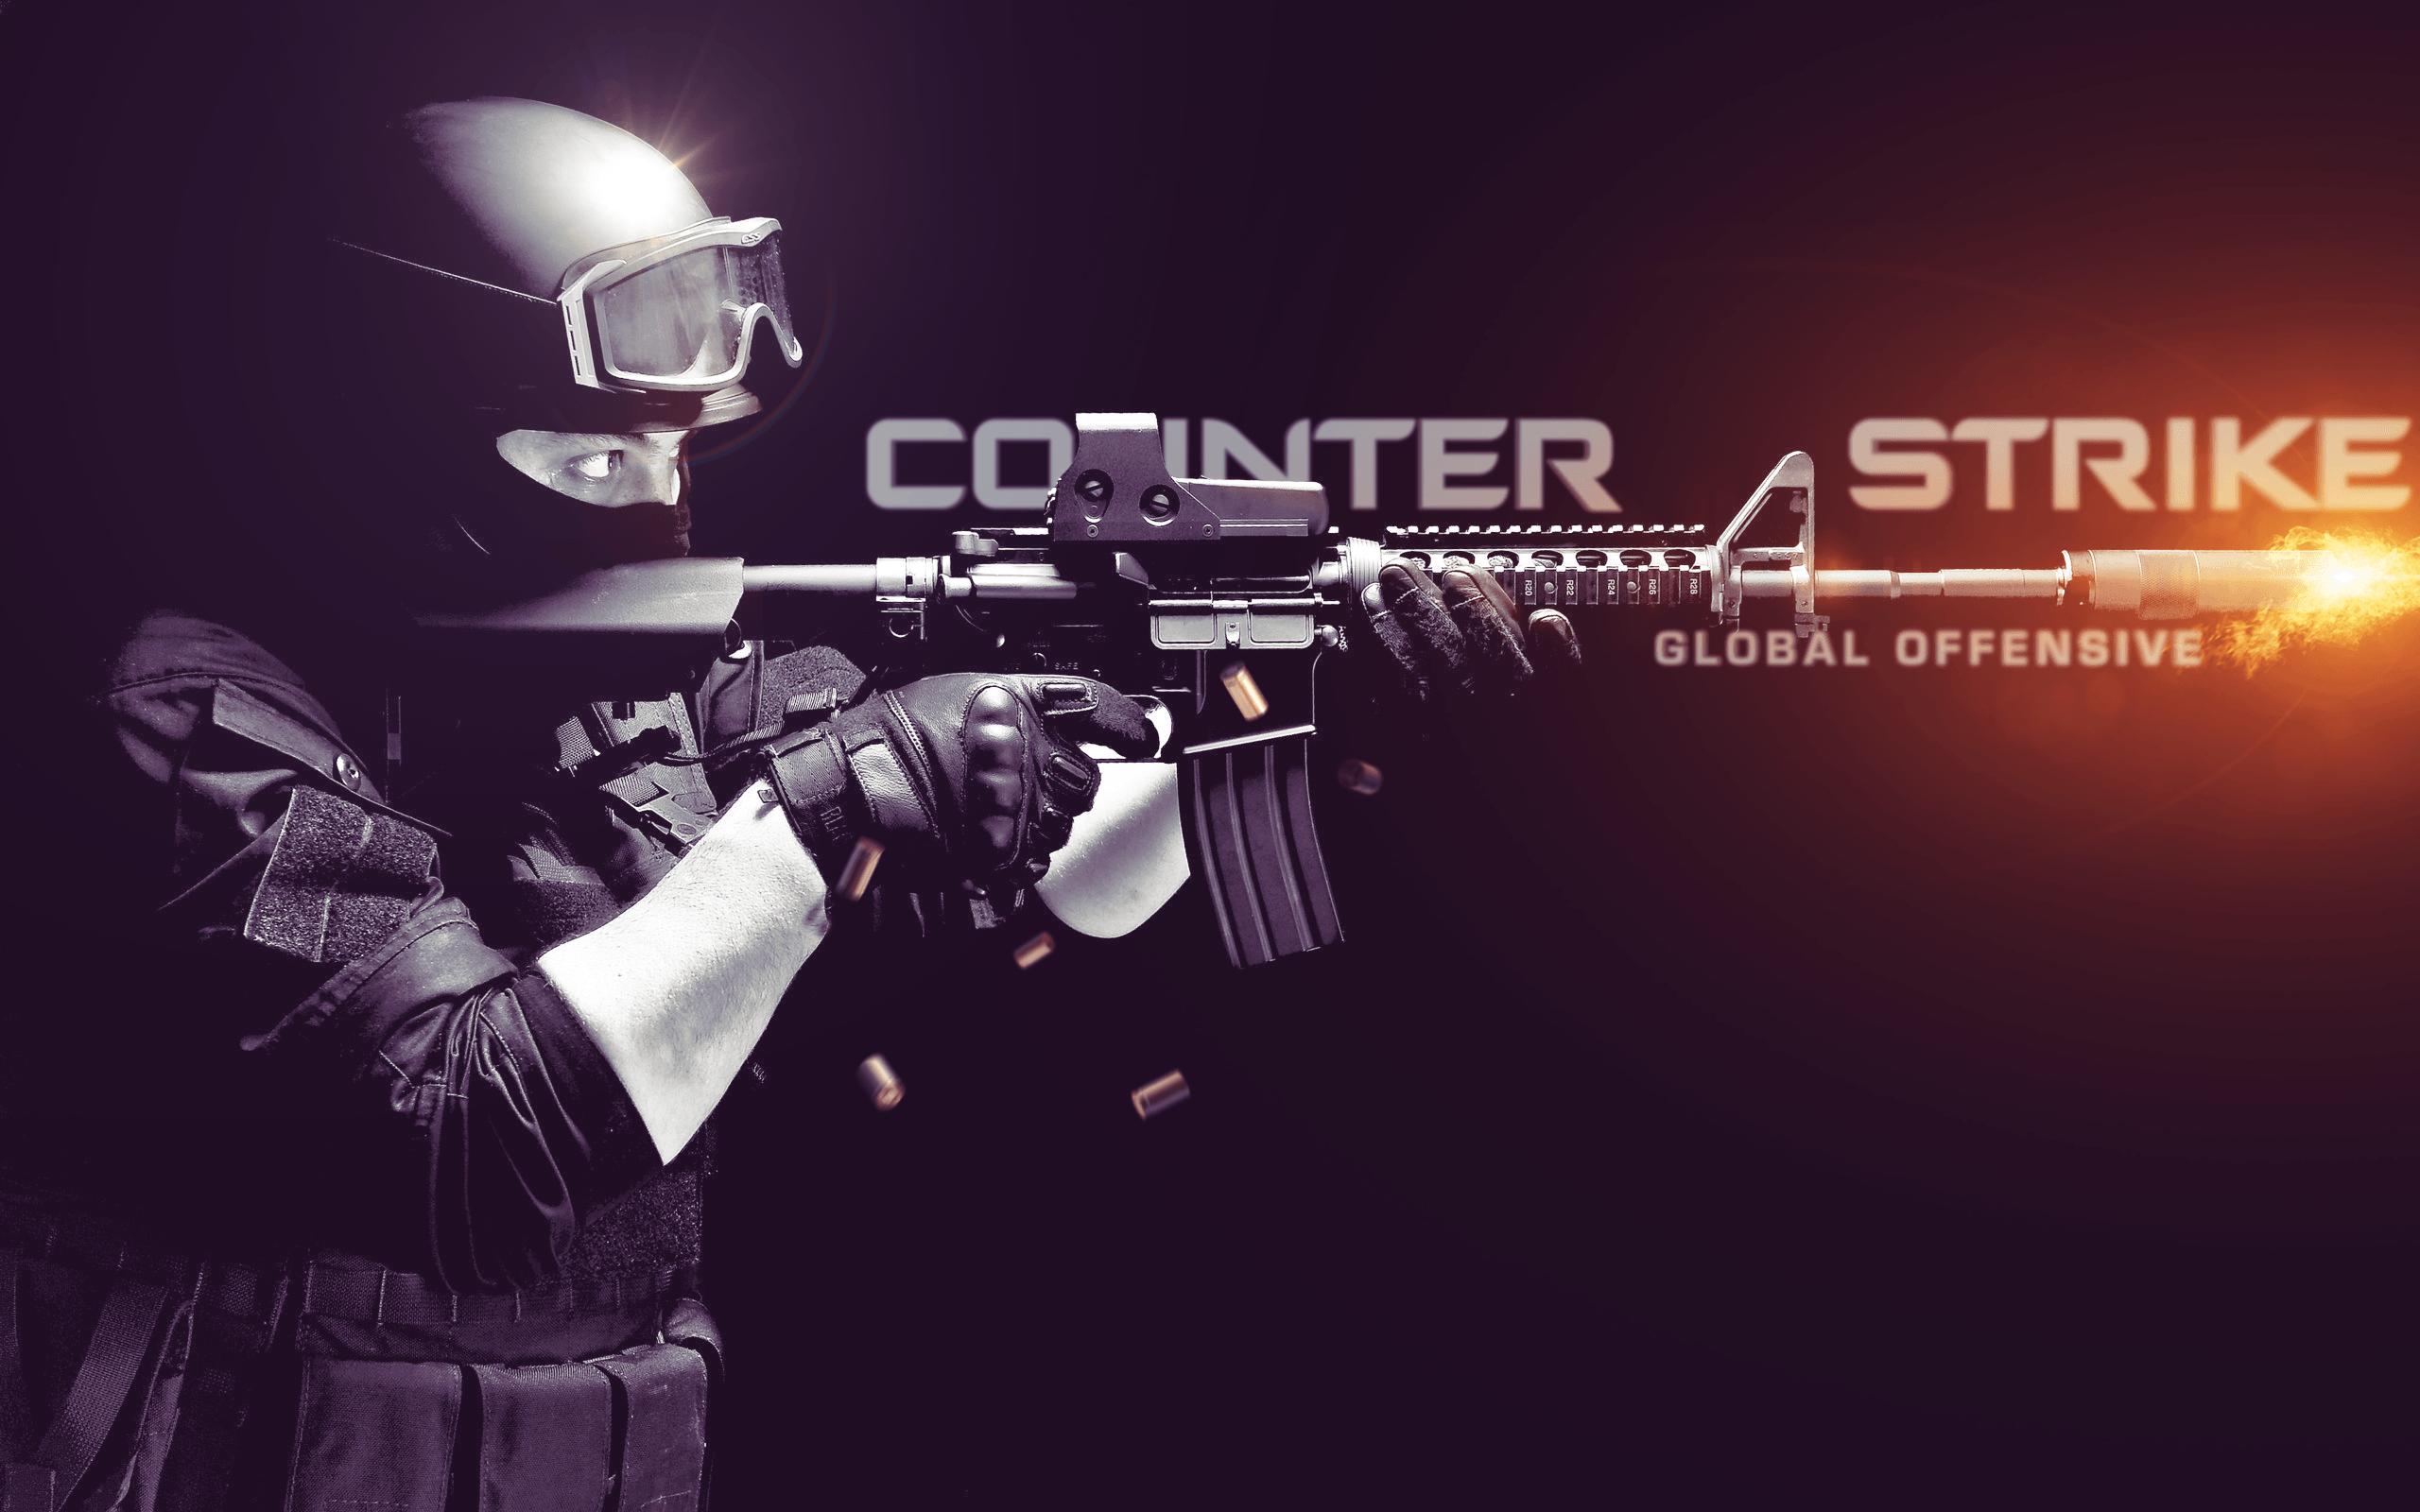 Counter Strike Global Offensive Desktop Wallpapers Top